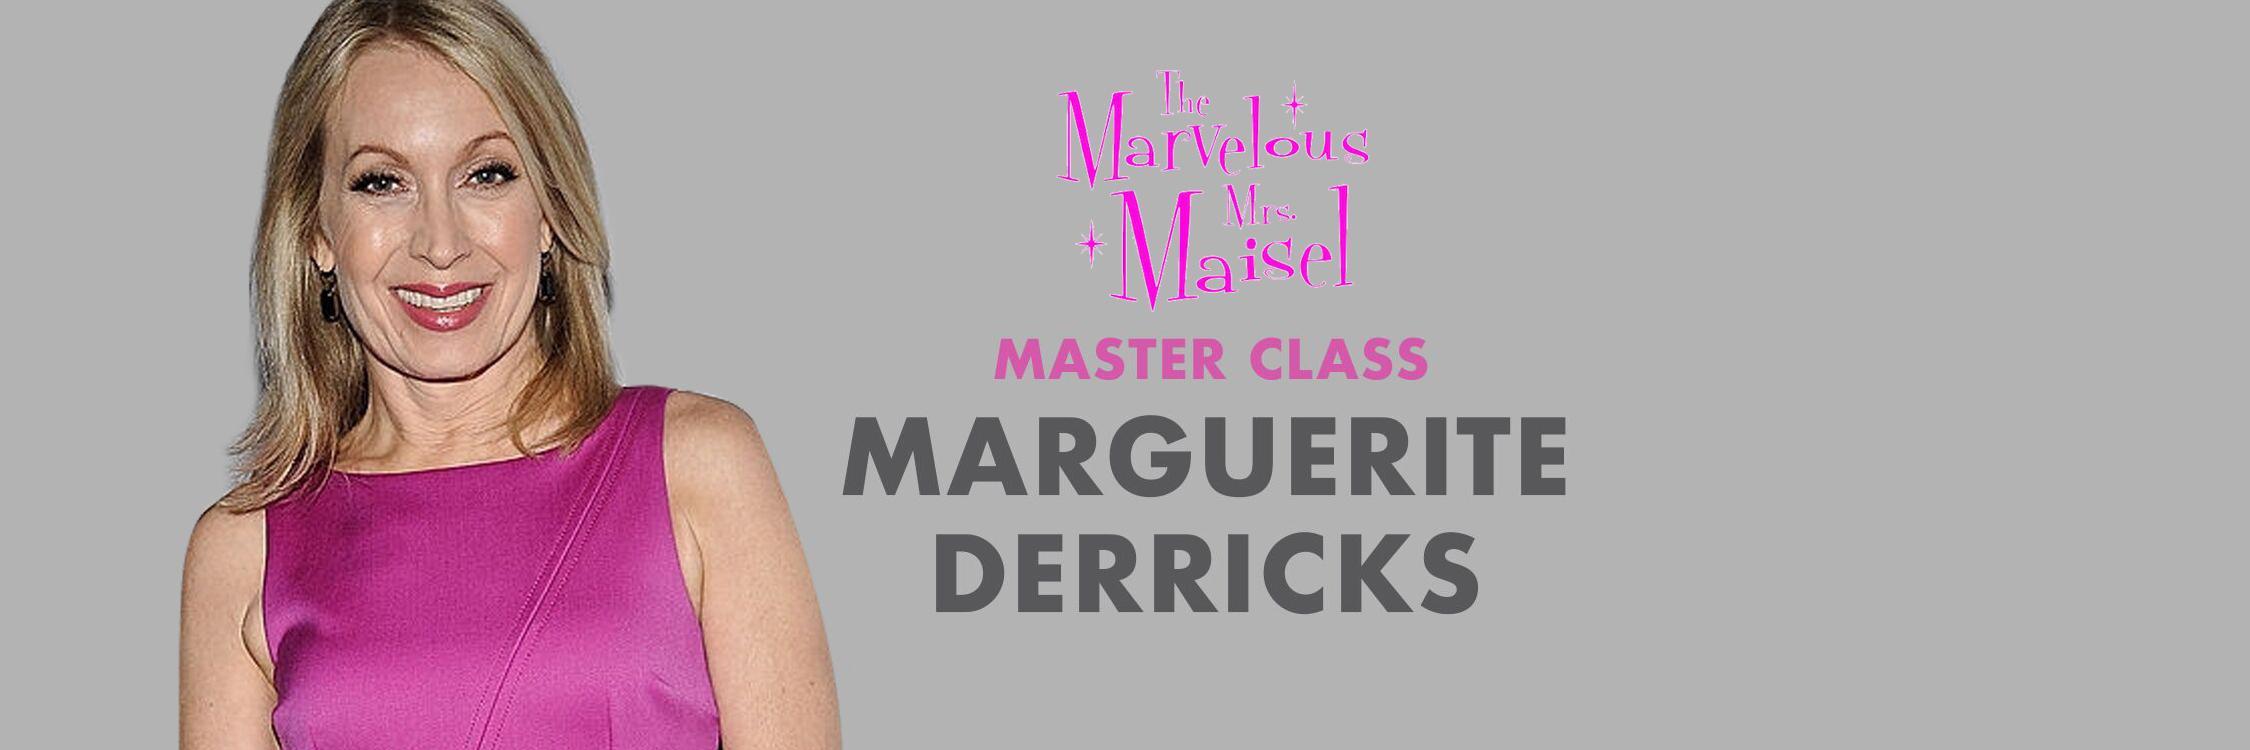 Marguerite Derricks Master Class